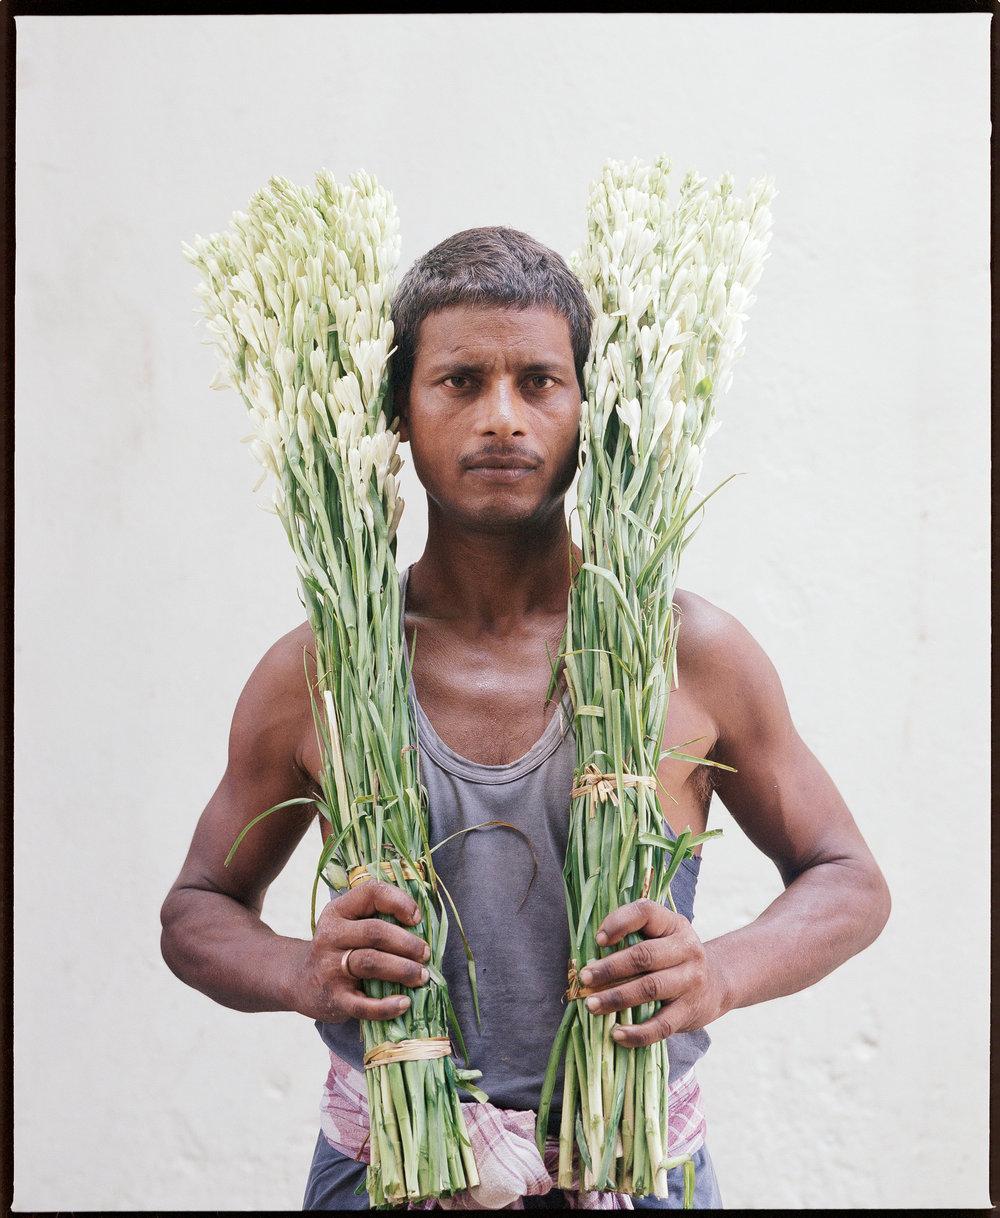 Kolkata_Flowers-13.jpg